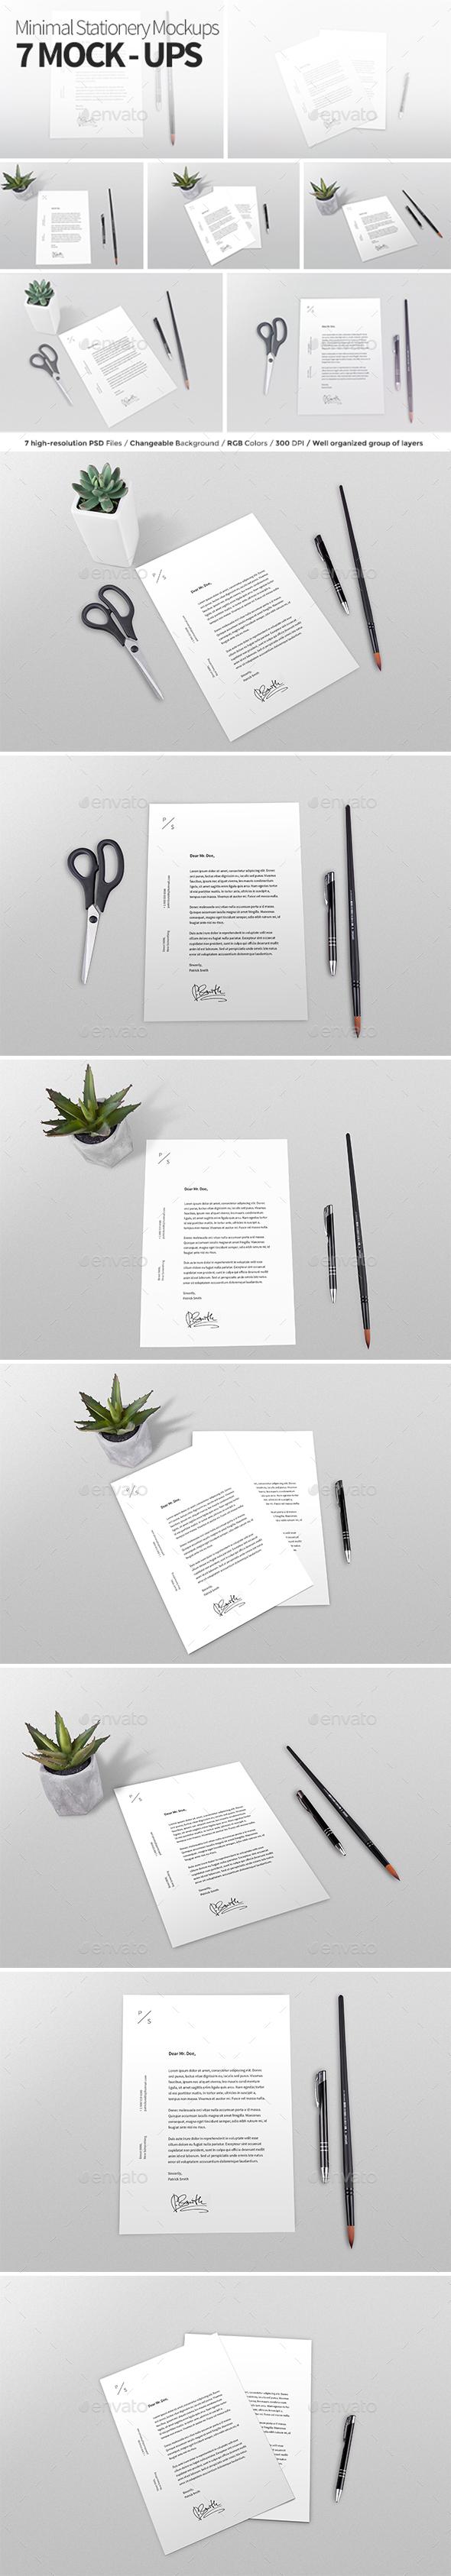 GraphicRiver Minimal Stationery Mock-ups 20710269